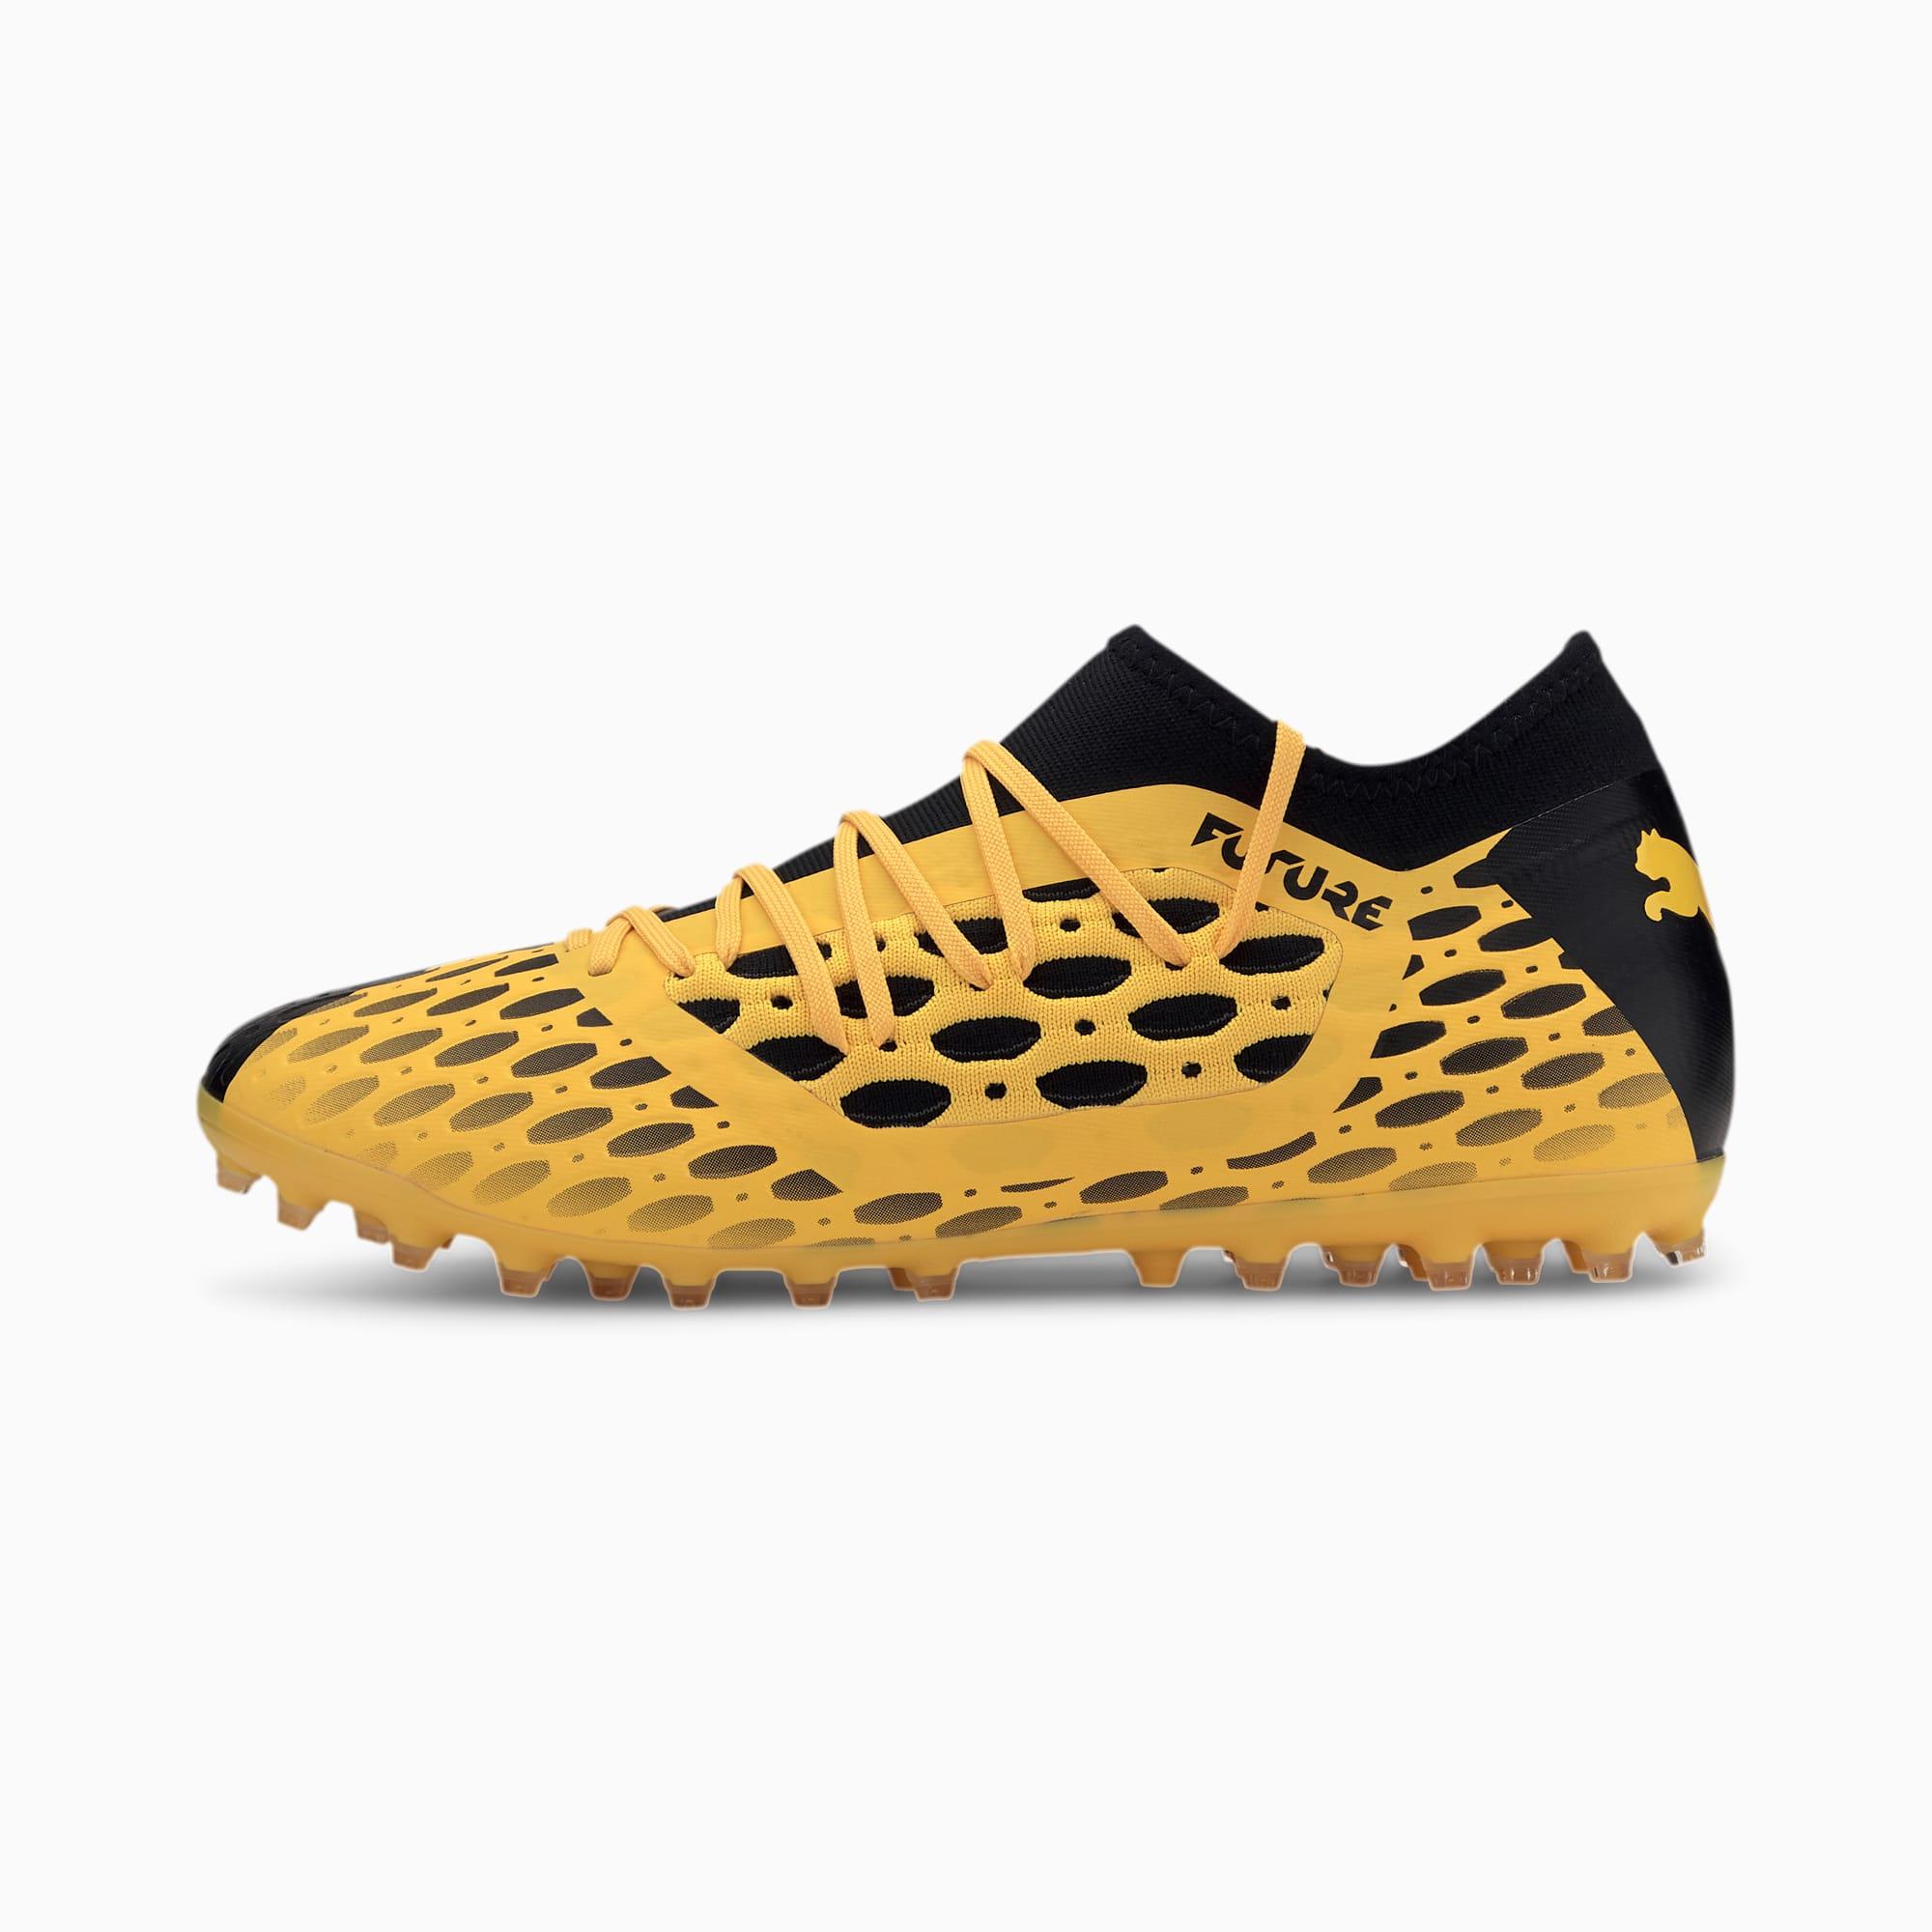 FUTURE 5.3 NETFIT MG Men's Football Boots